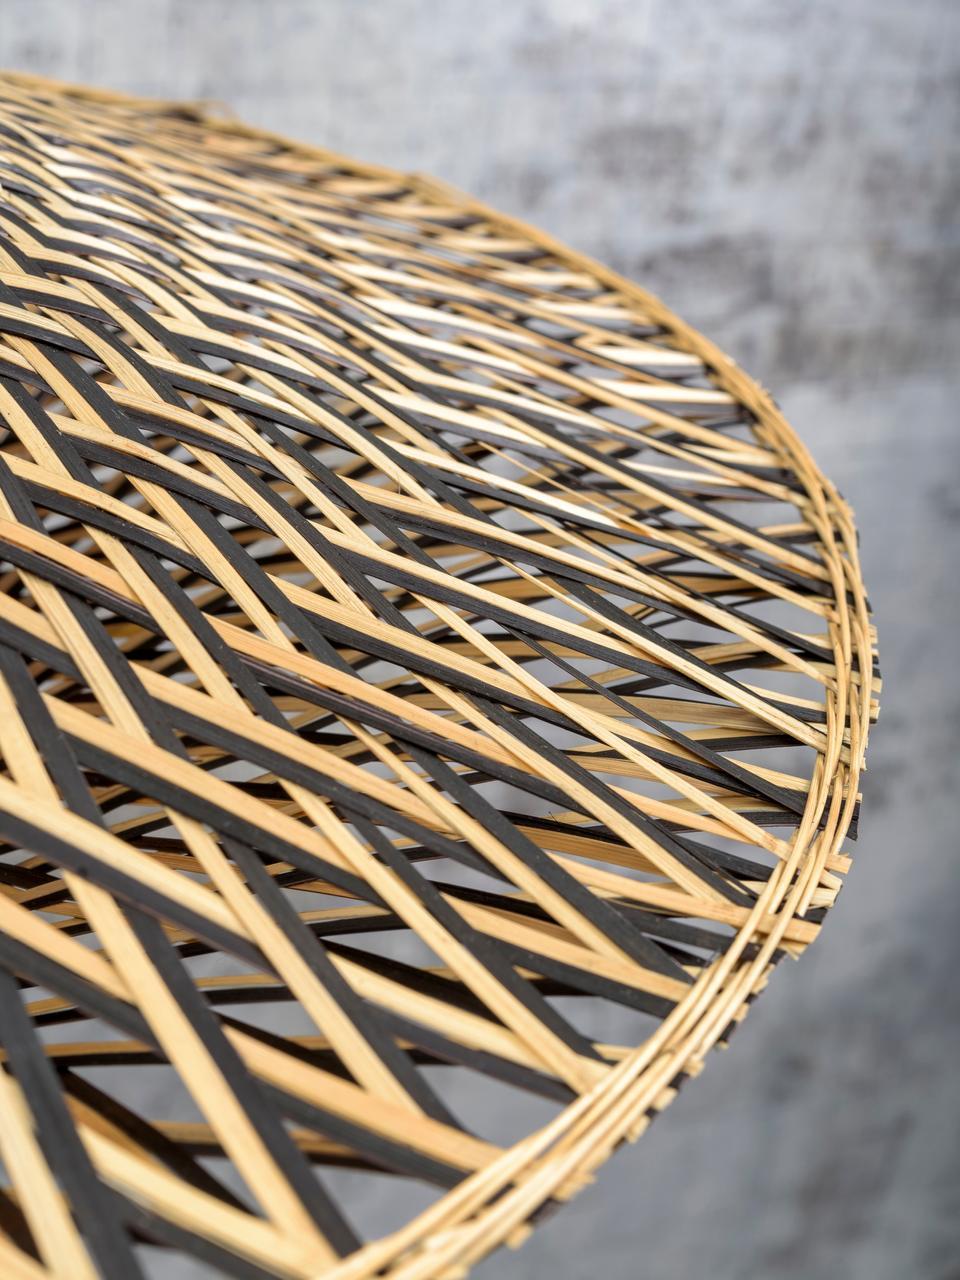 Boho-Deckenleuchte Bali aus Bambus, Lampenschirm: Bambus, Baldachin: Metall, beschichtet, Beige, Schwarz, Ø 44 x H 12 cm